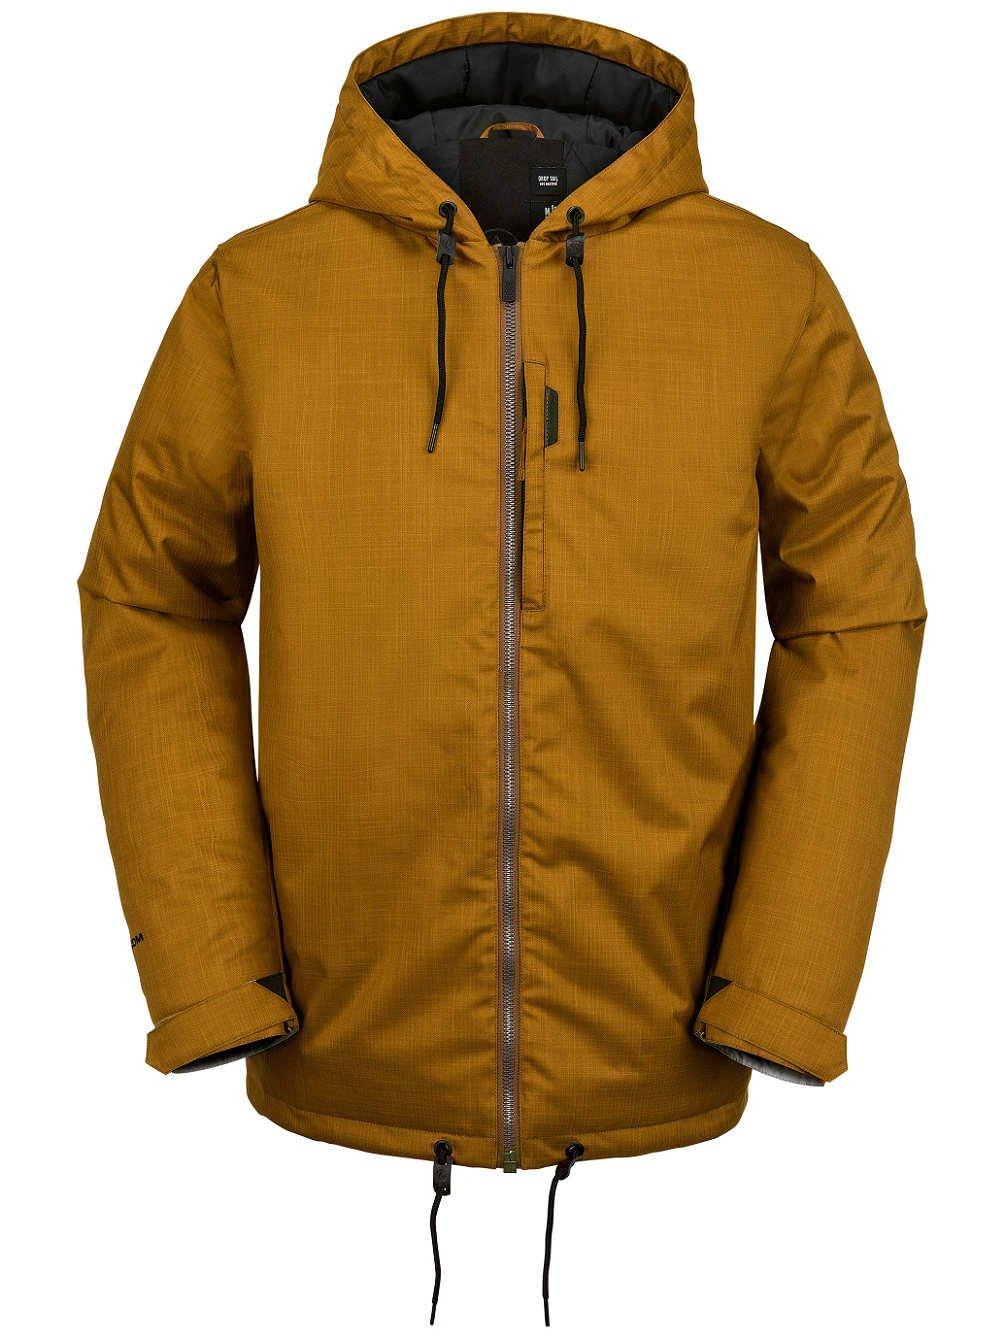 Herren Snowboard Jacke Volcom Patch Ins Jacket